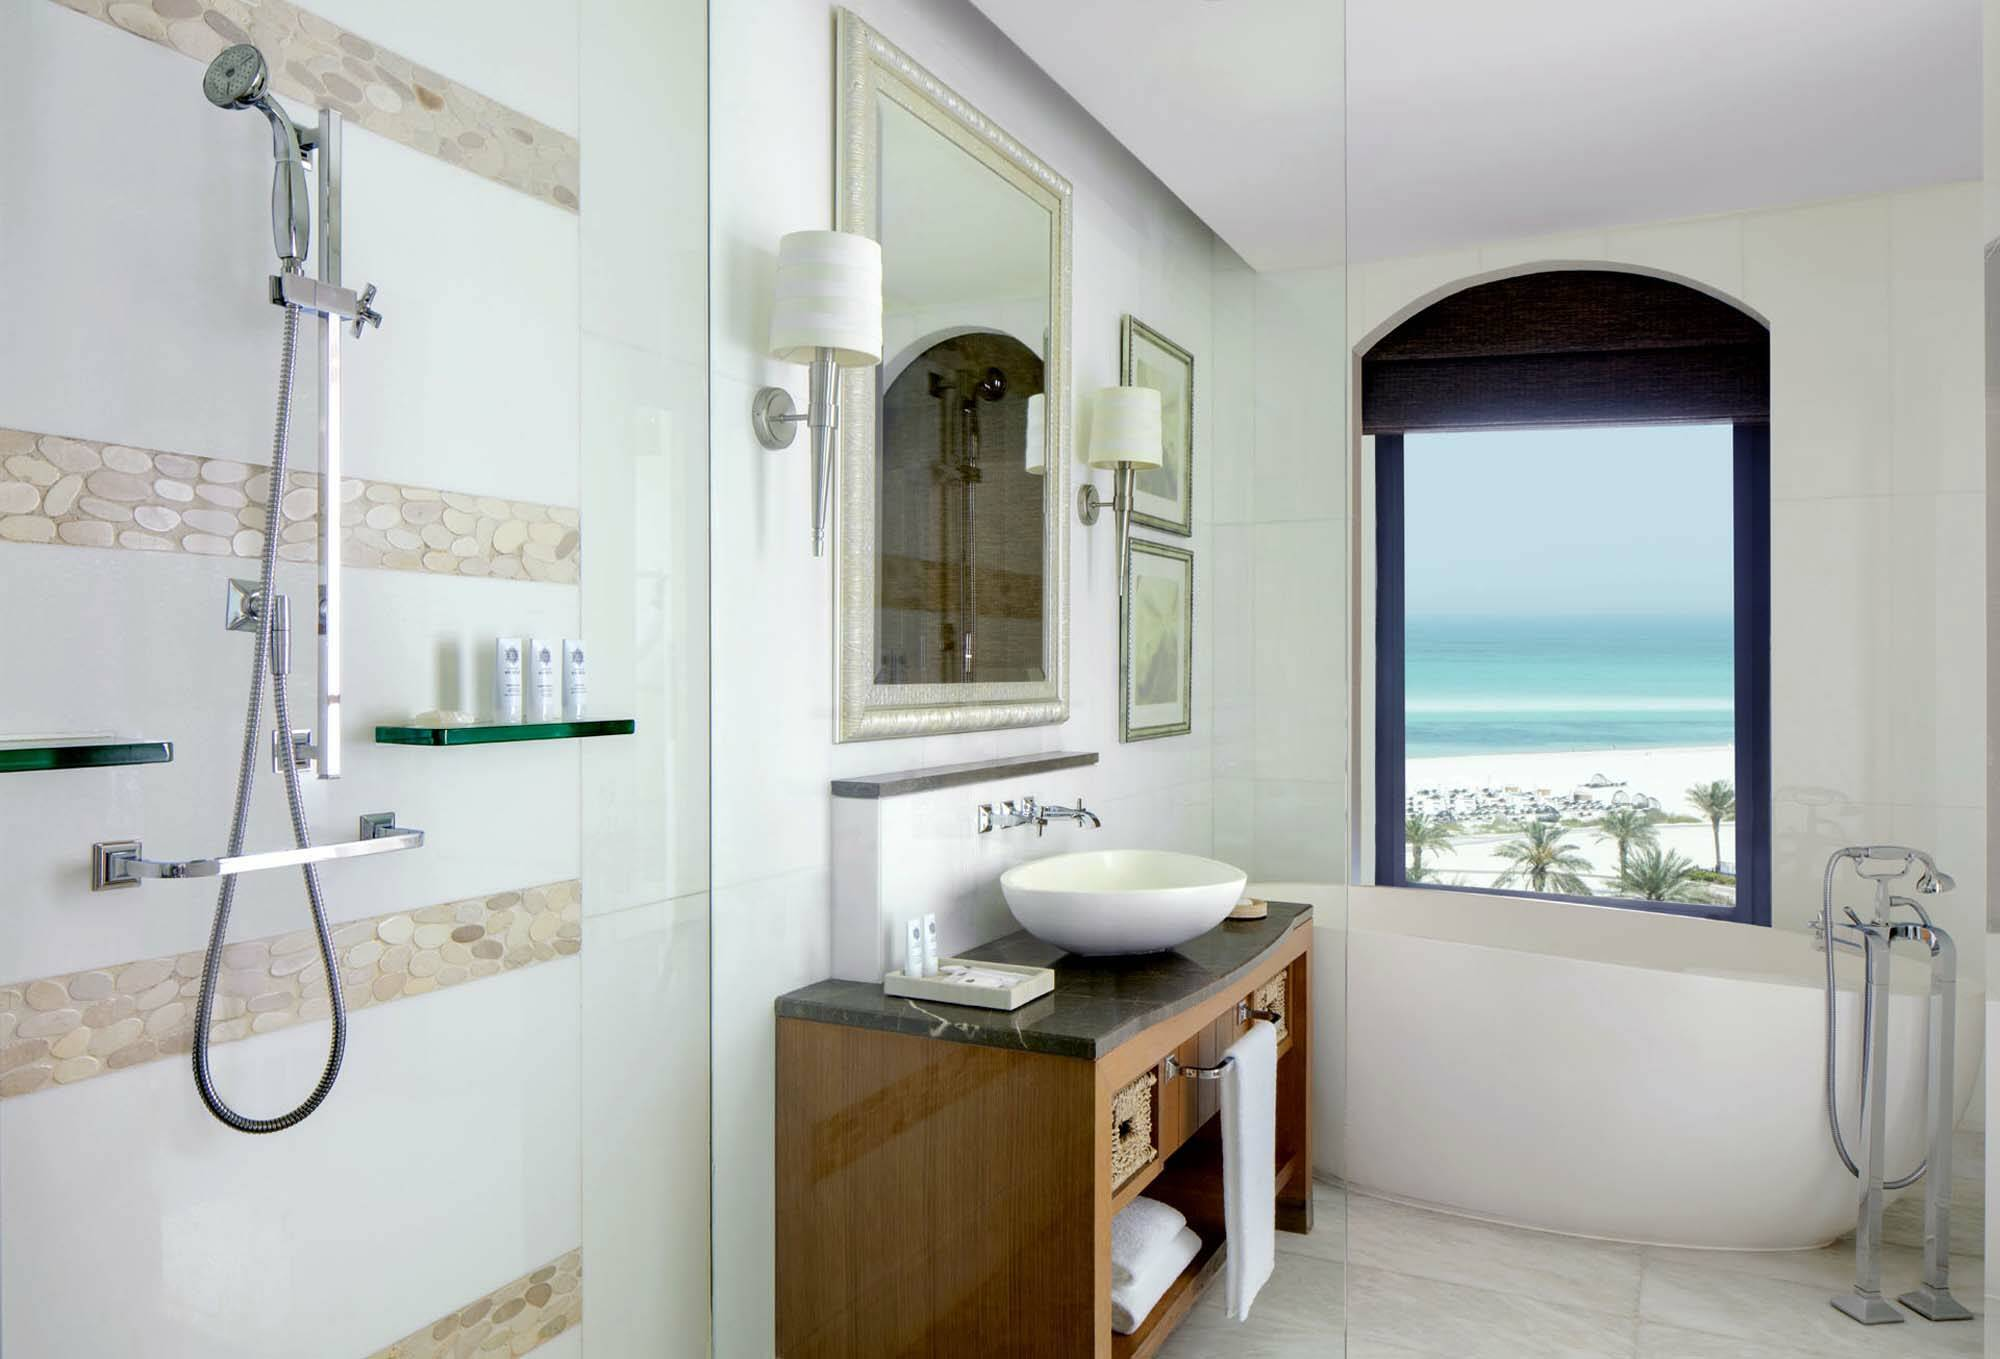 Saint Regis Saadiyat Abu Dhabi premium sea view salle de bain